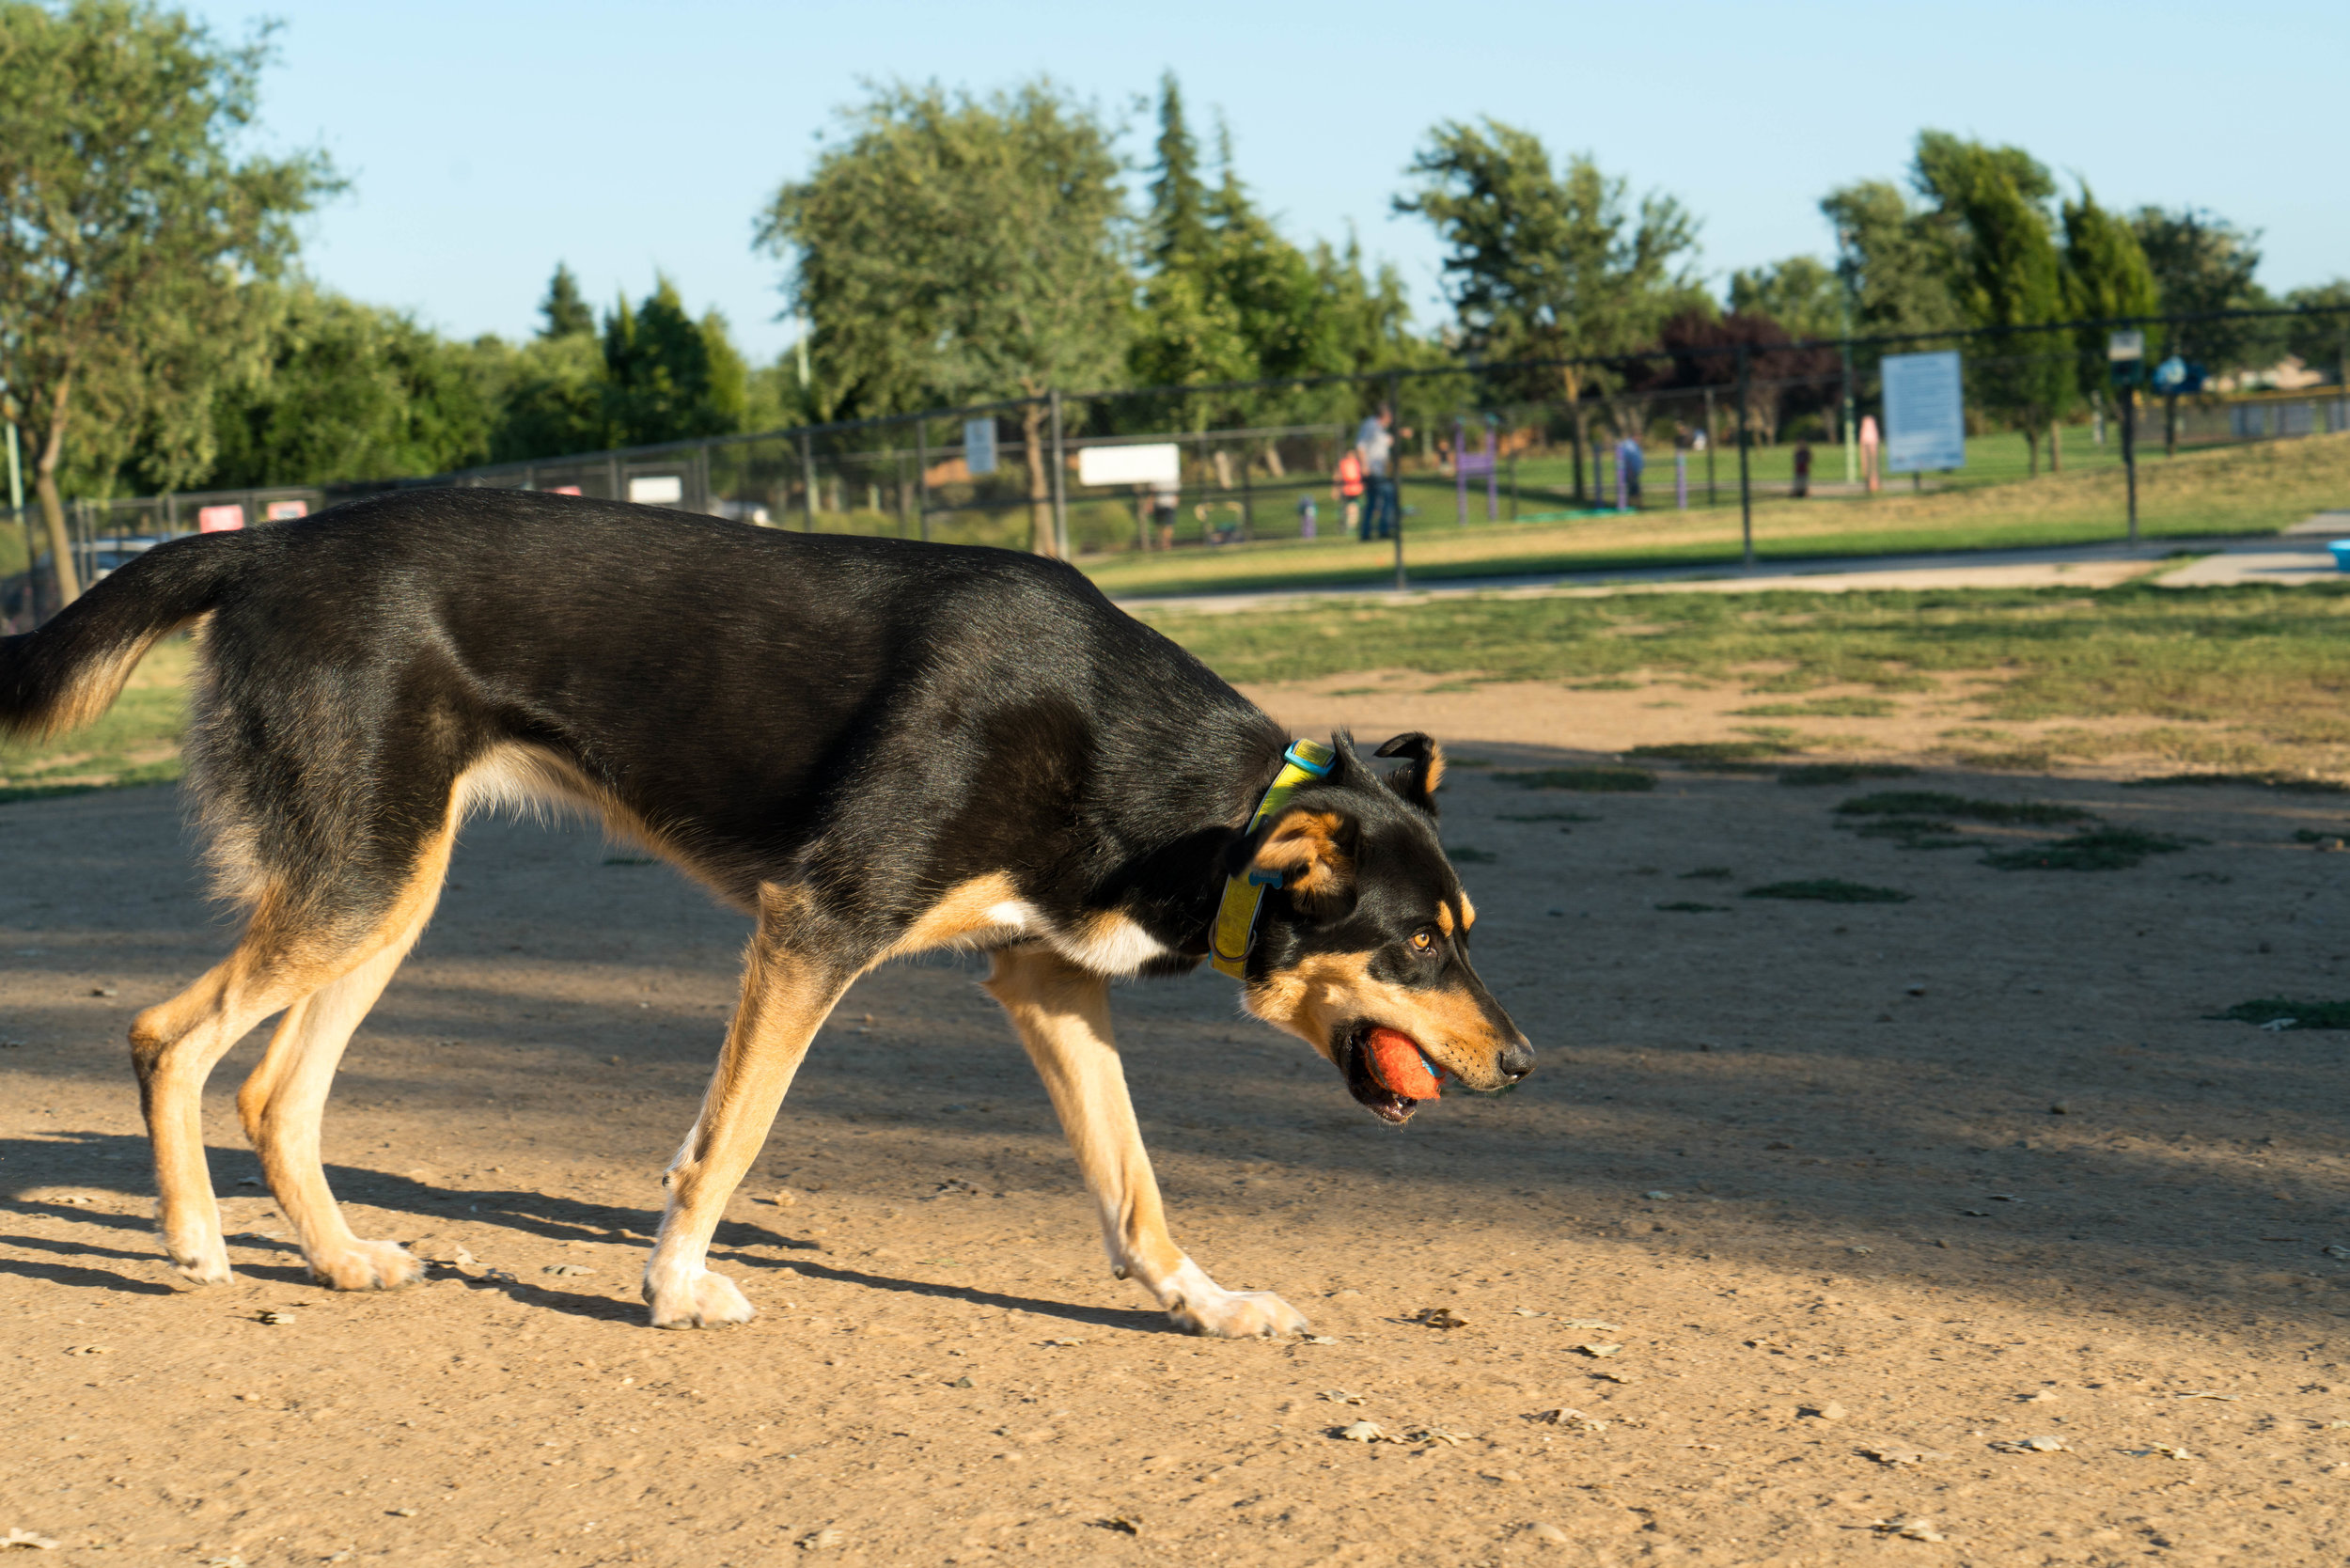 dog-park-jul-4-weekend-15.jpg